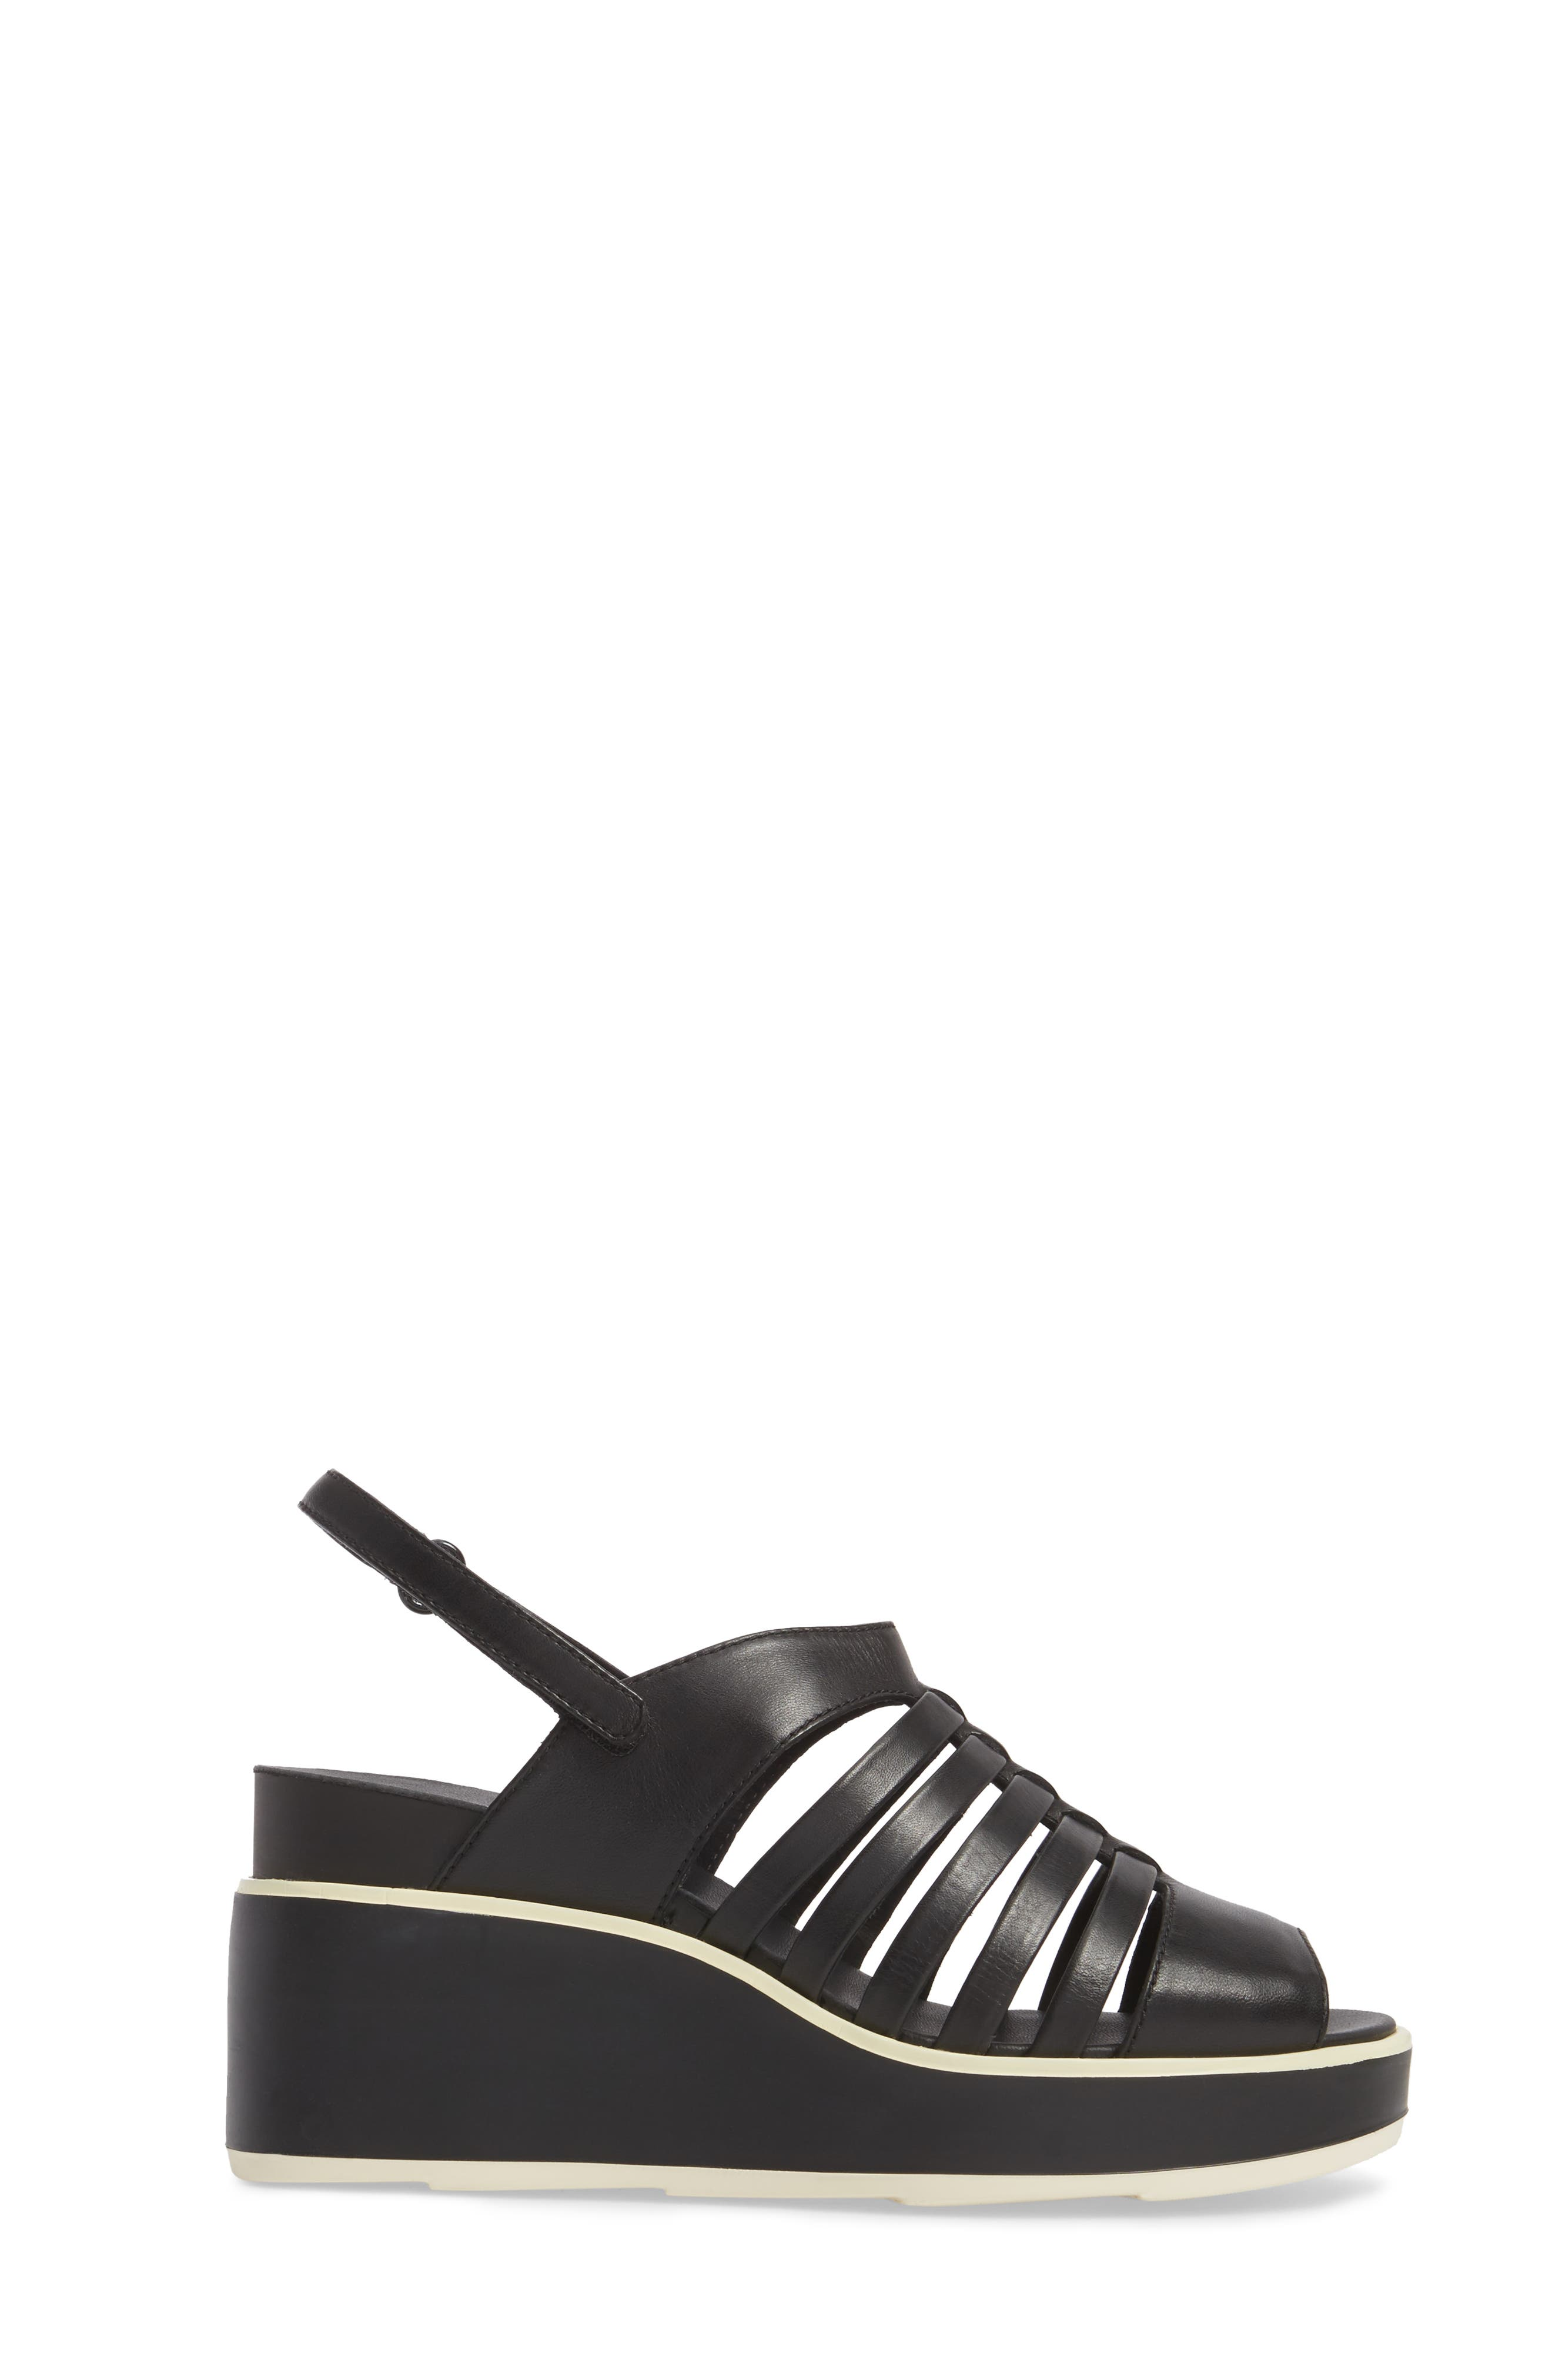 Tropik Strappy Wedge Sandal,                             Alternate thumbnail 3, color,                             Black Leather